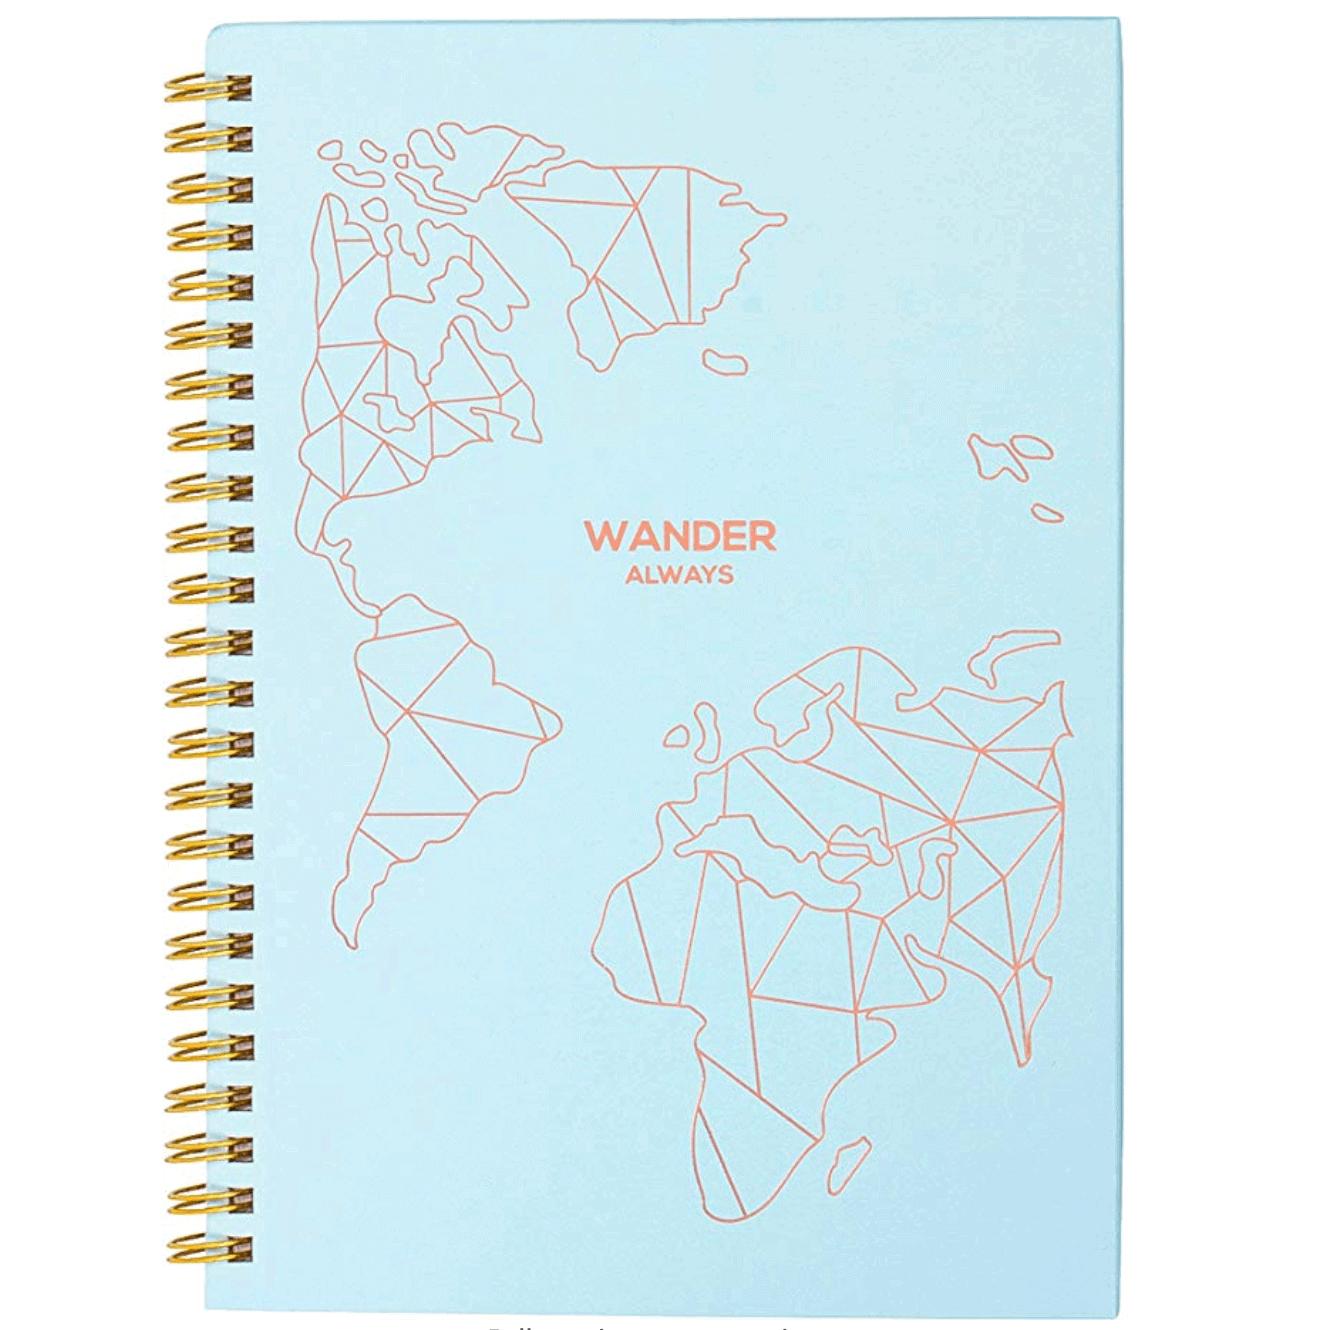 Cute women's travel planner journal - Best travel gift ideas under $50